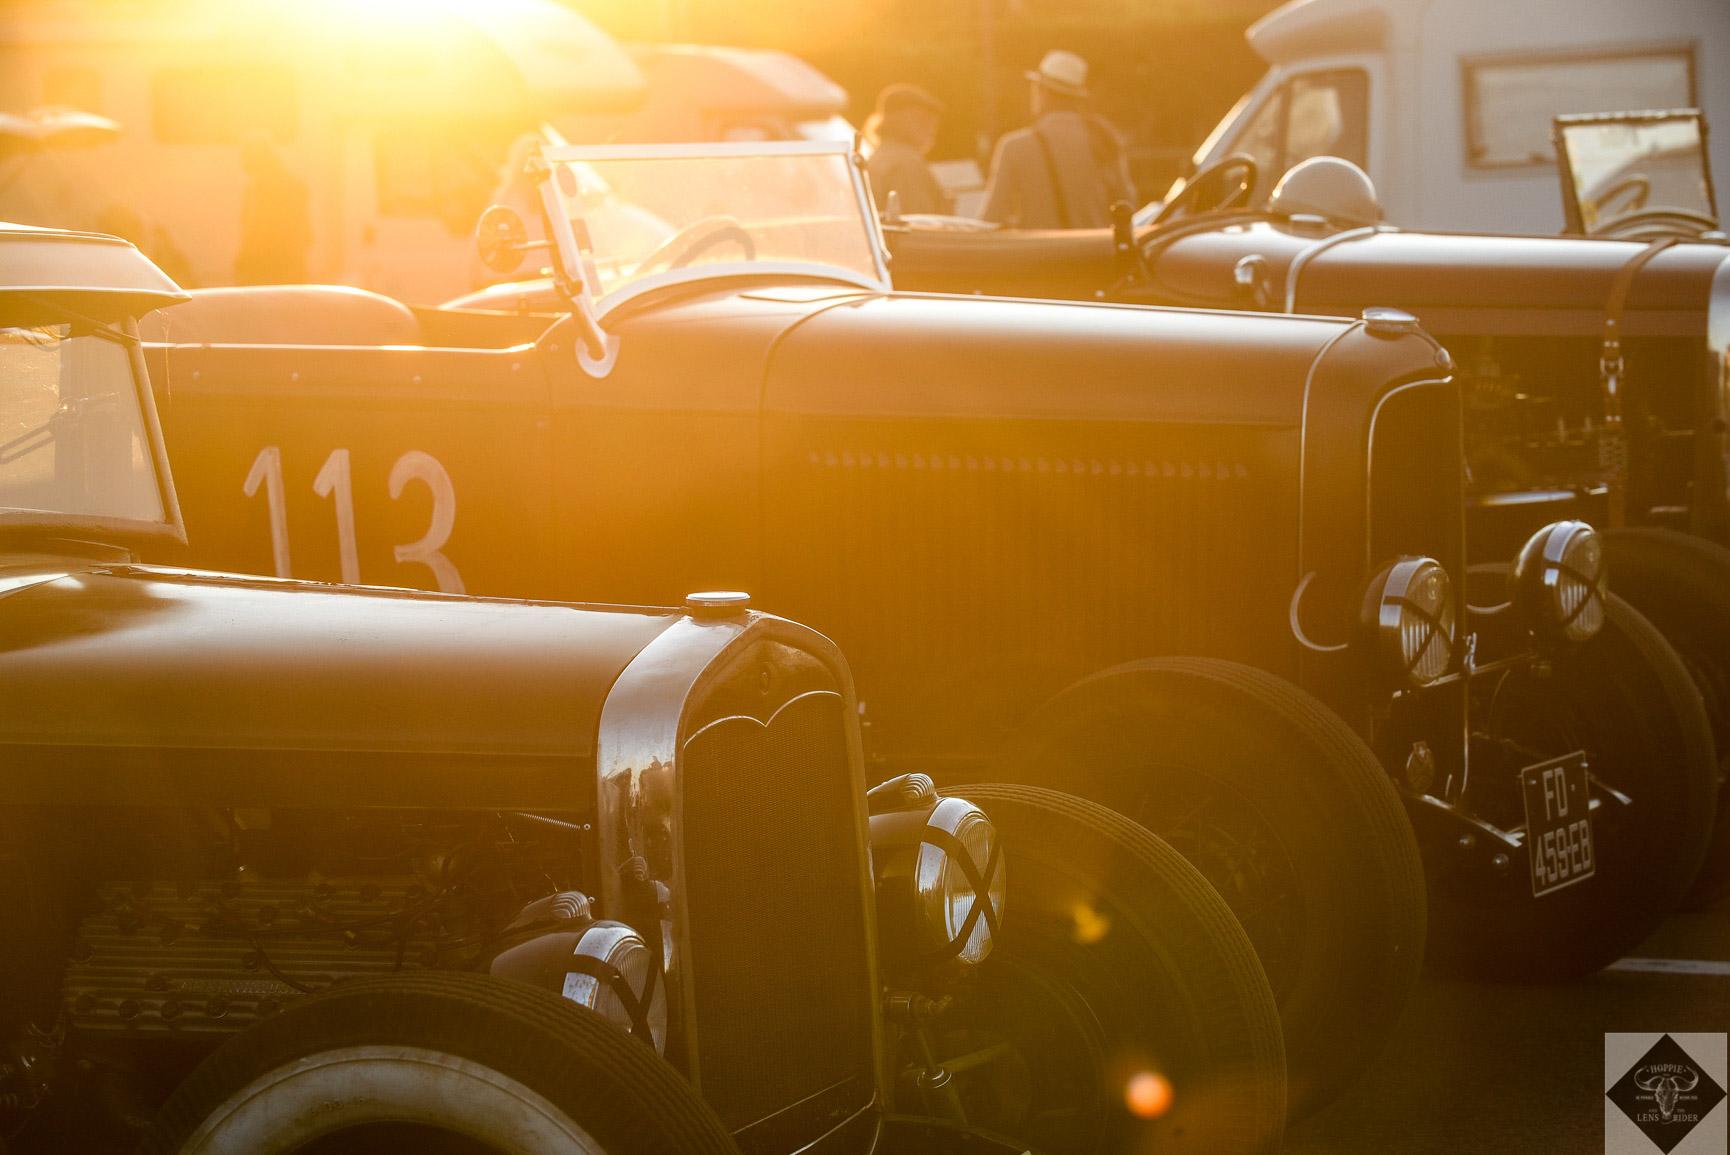 ANL_4427 car sunrise